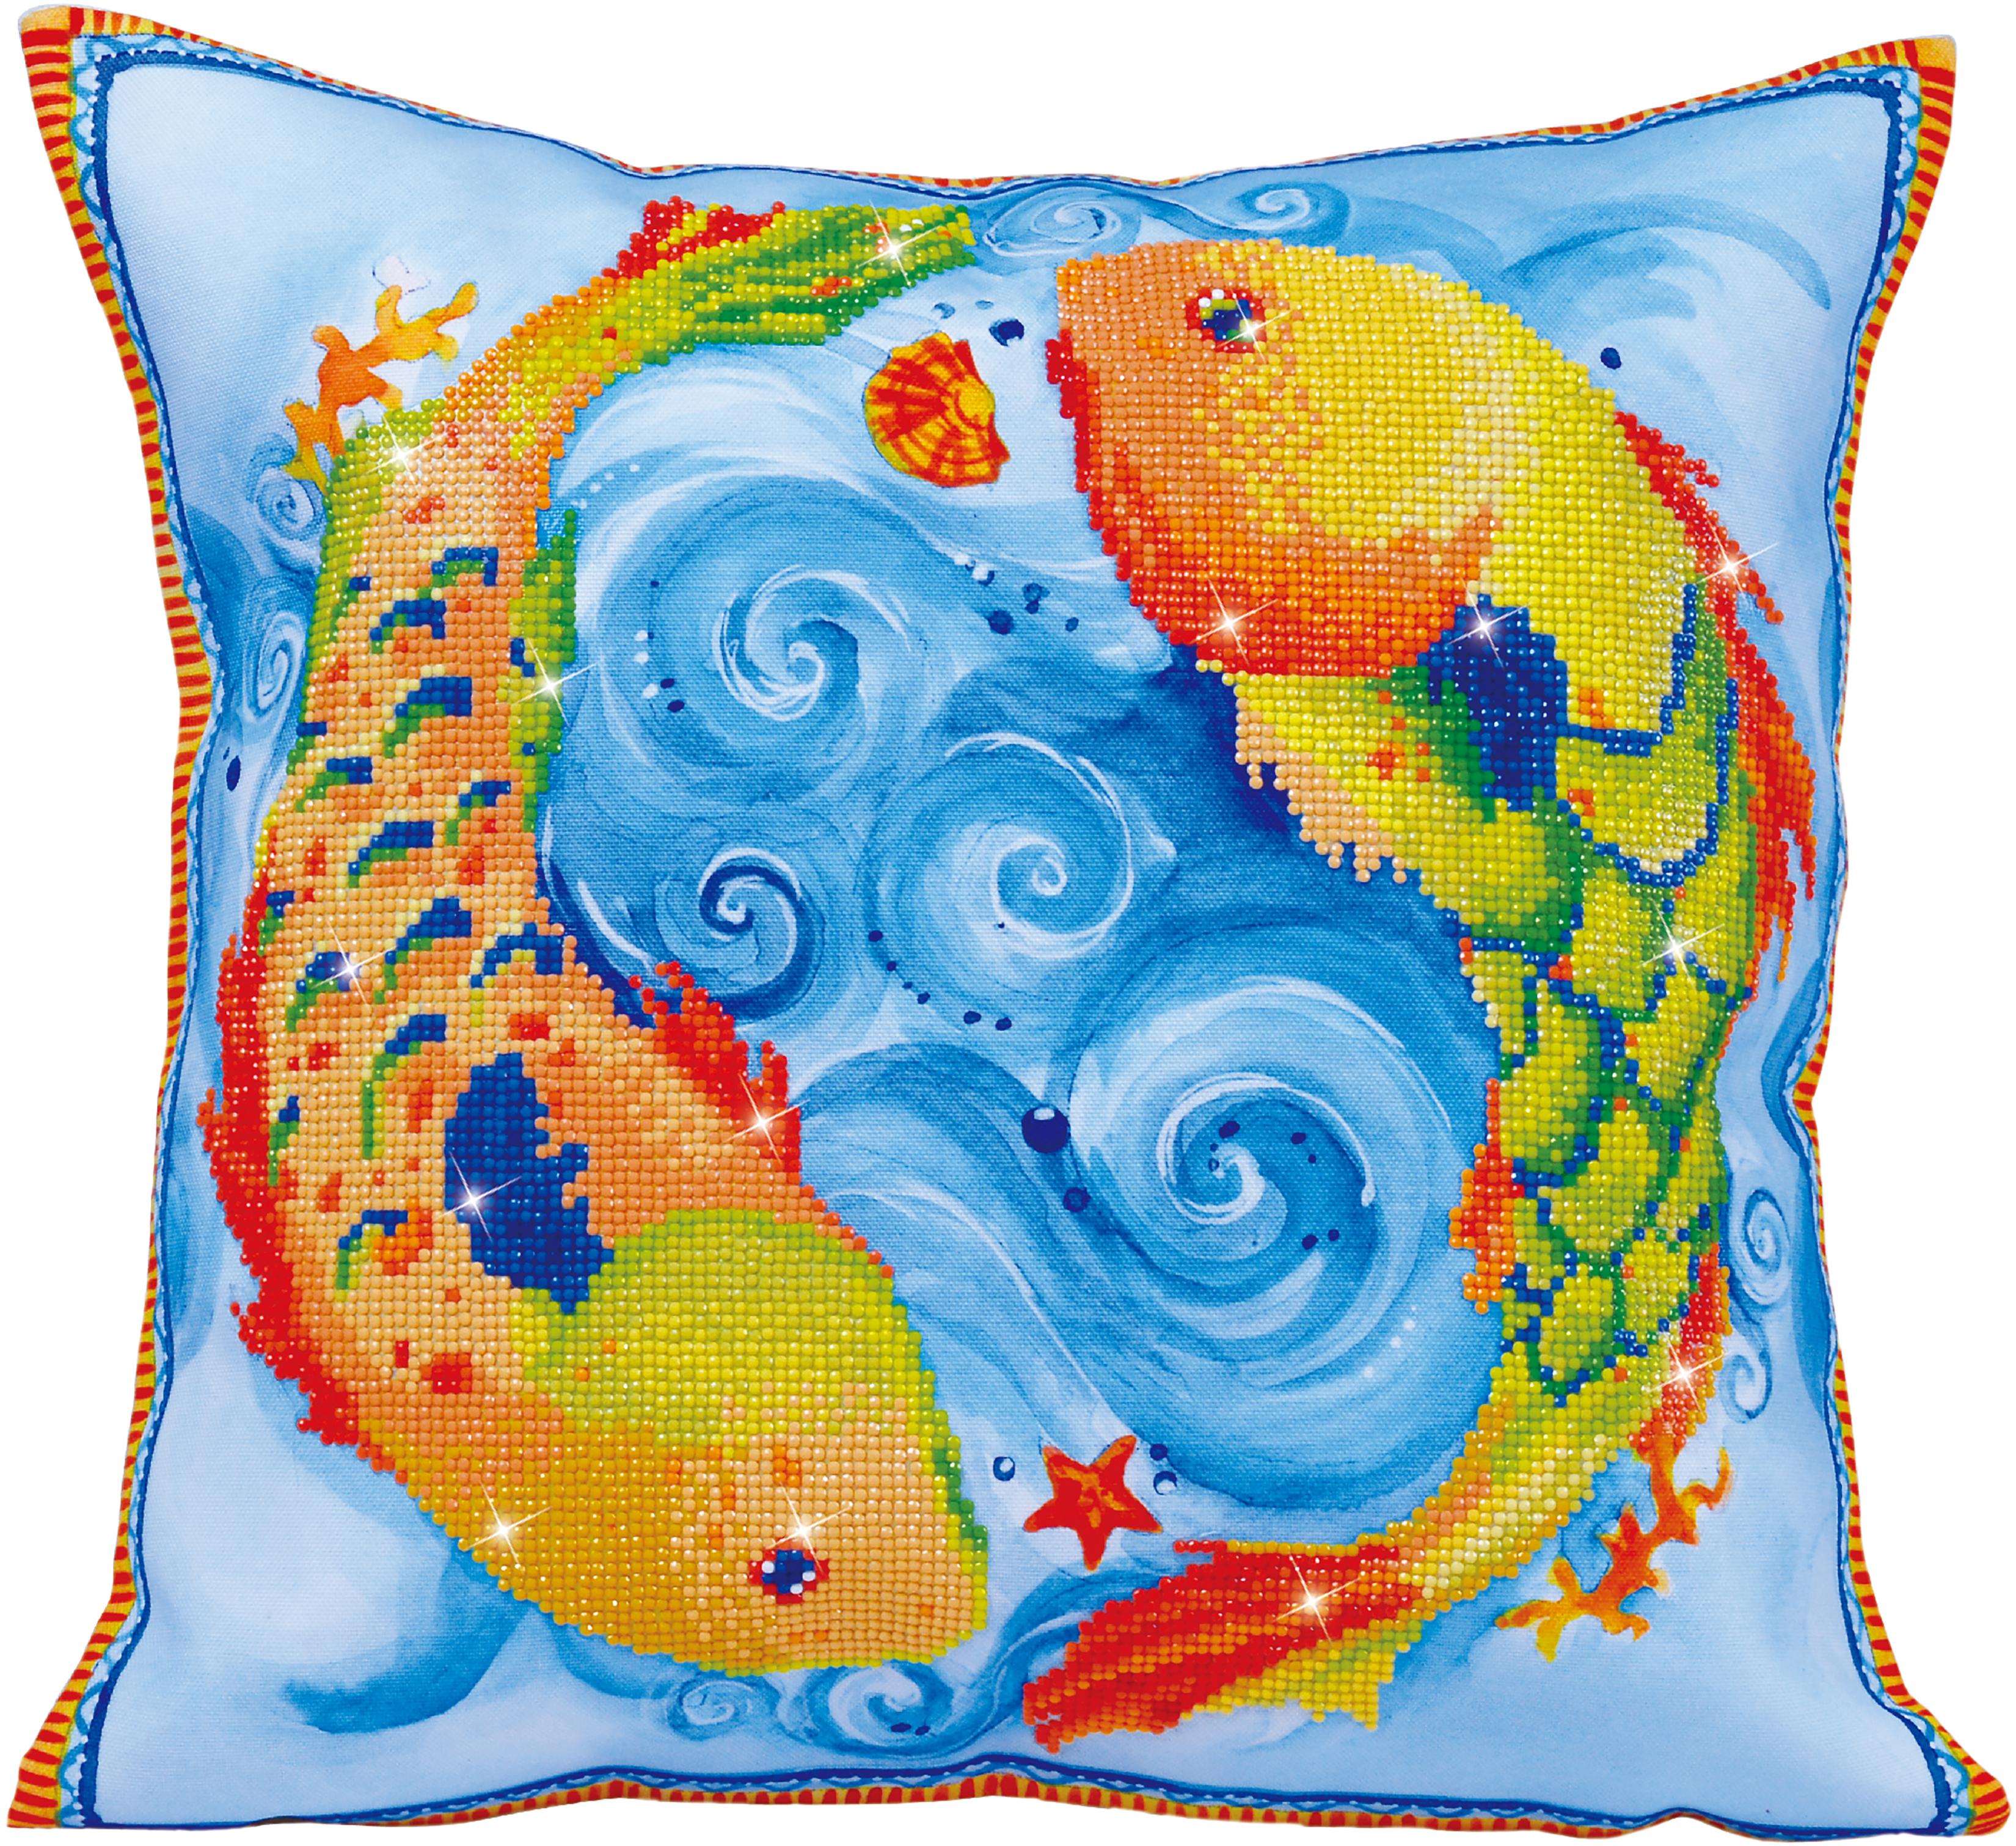 Diamond Dotz Diamond Embroidery Pillow Facet Art Kit-Dancing Fish (17.5X17.5)